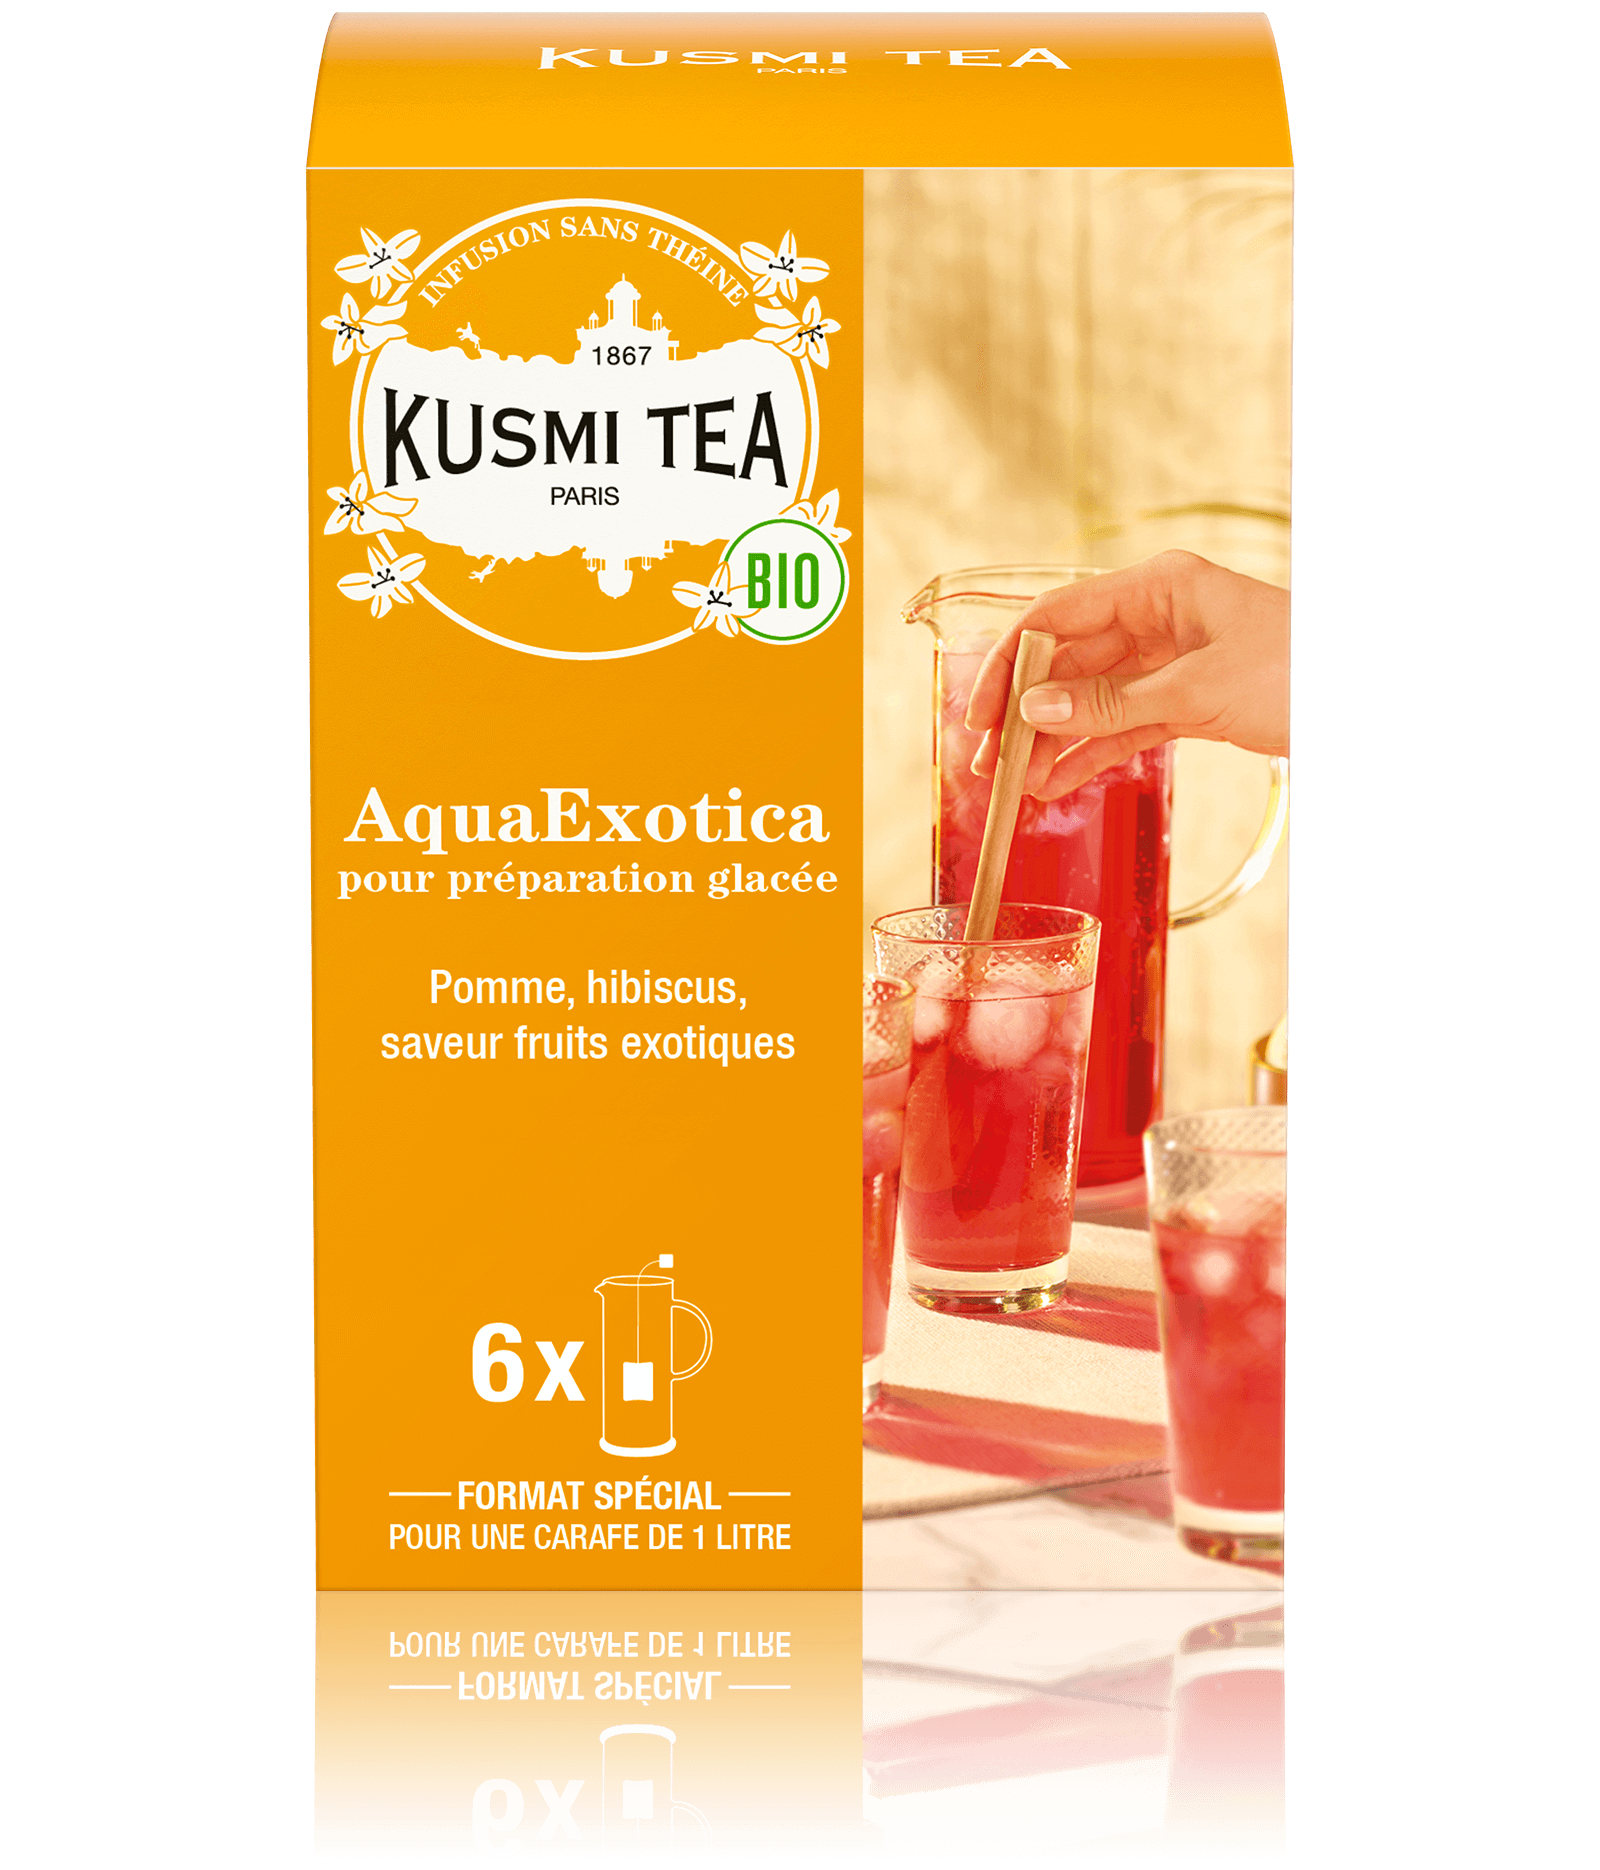 AquaExotica Infusion glacée bio aux fruits exotiques Kusmi Tea